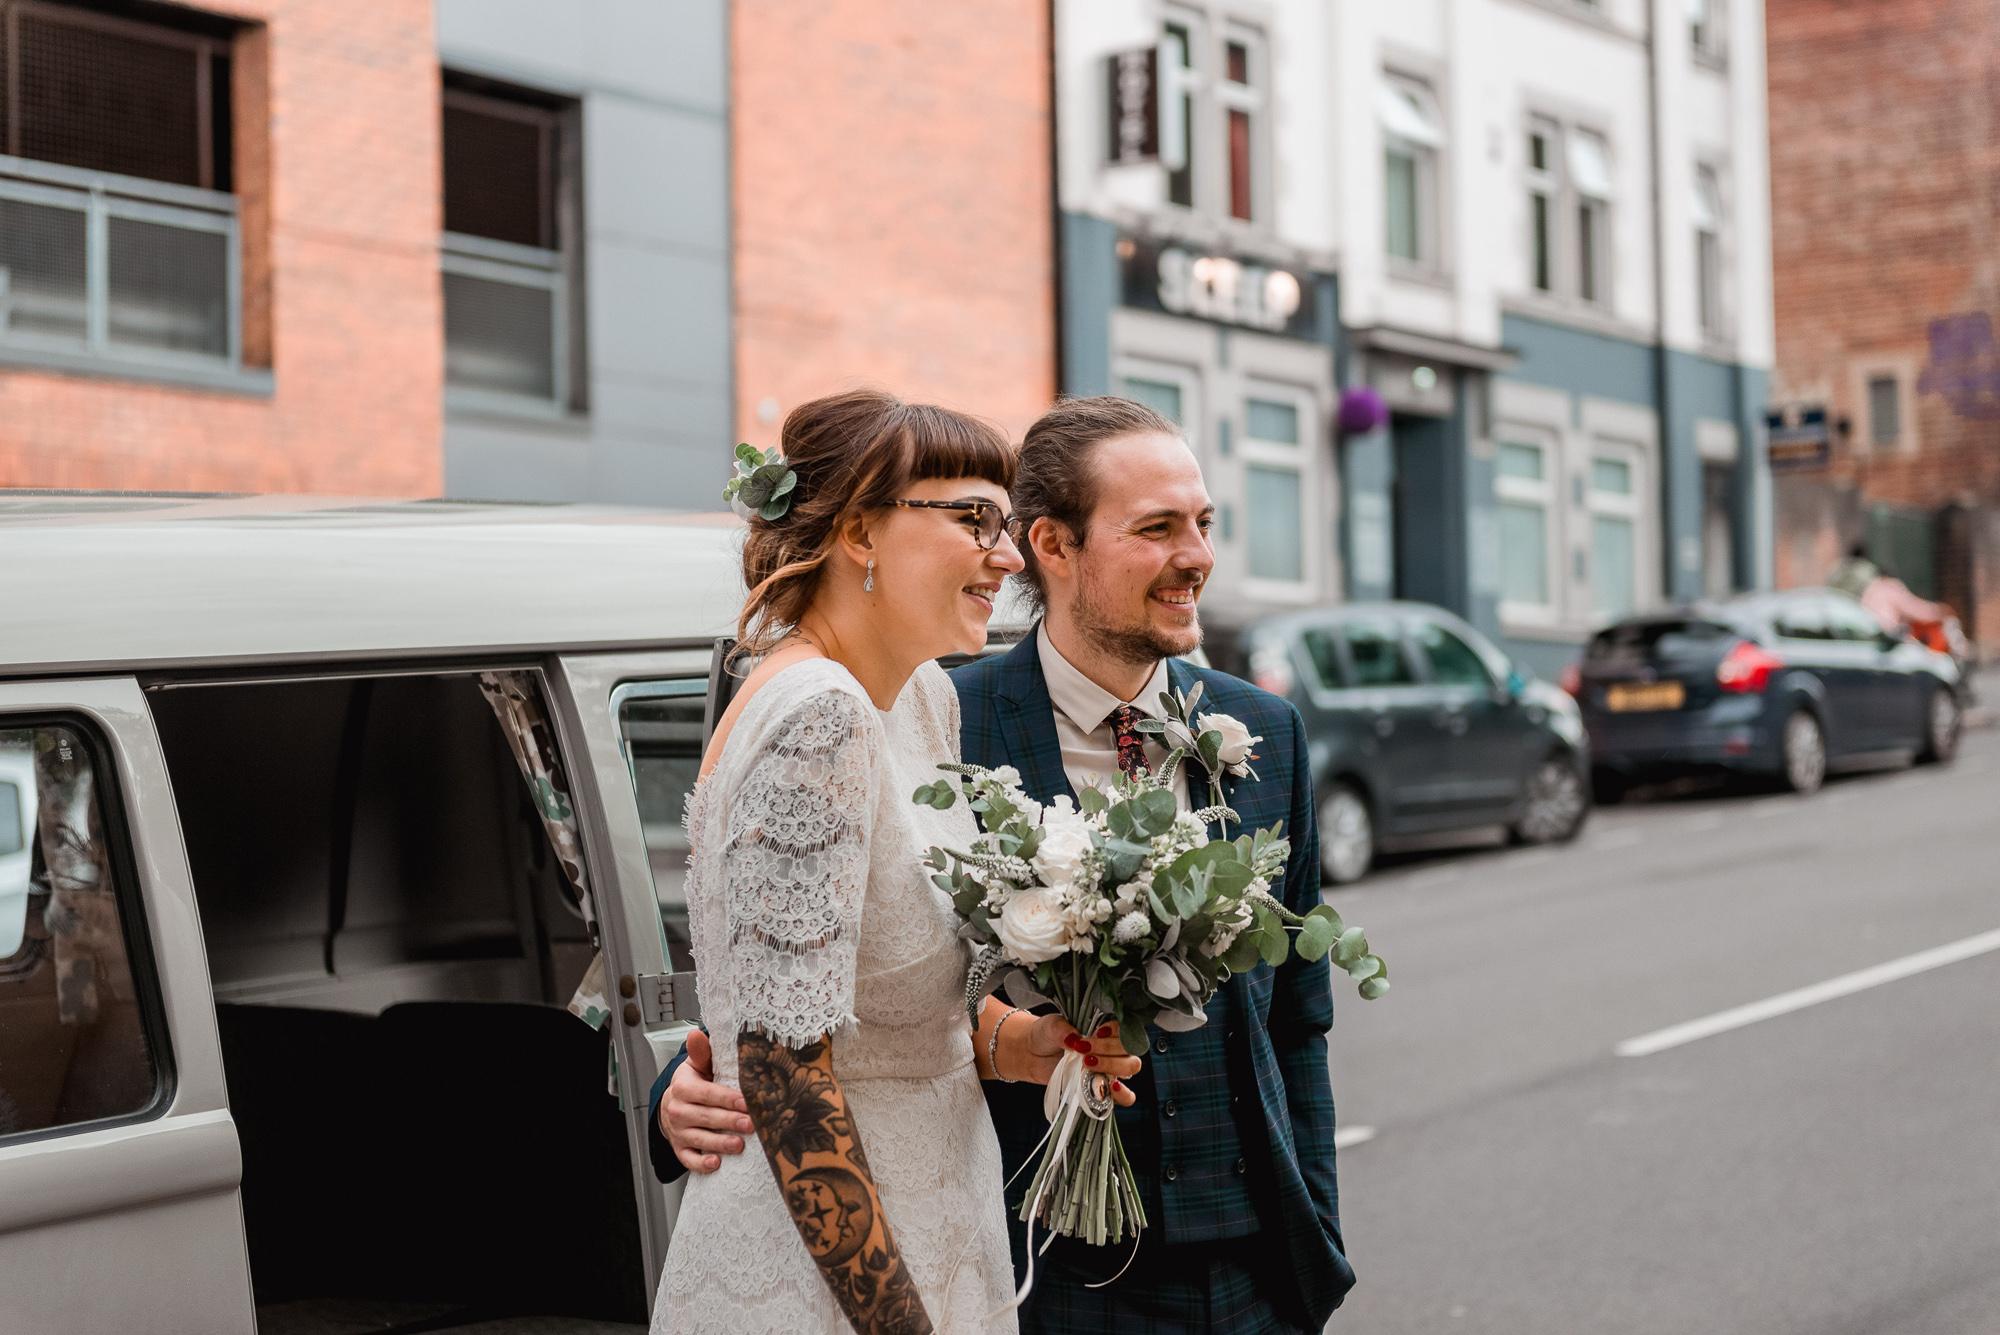 Harriet-Dahlia-Bespoke-Lace-Silk-Bohemian-Wedding-Dress-Sleeves-Tattooed-Bride-Alternative-Wedding-Sheffield-24.jpg